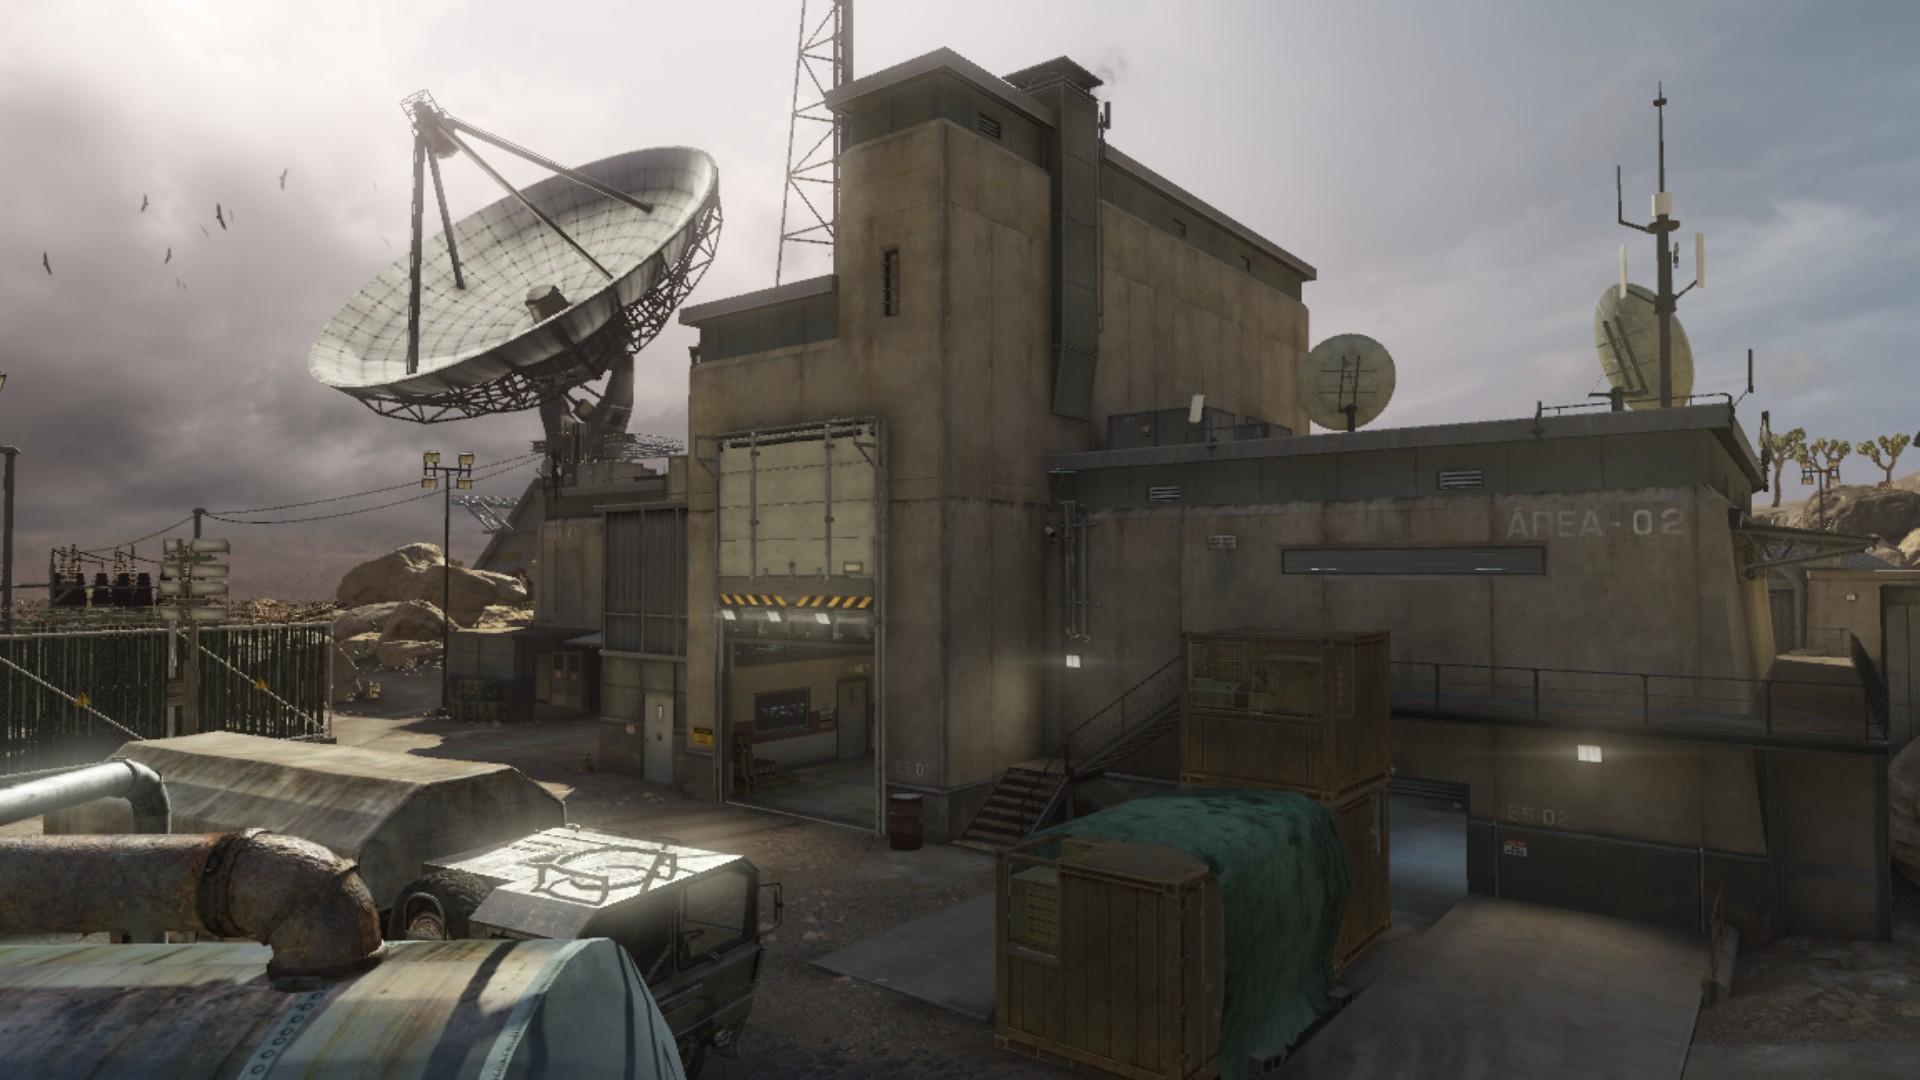 Raymond (Ray) Arriaga - COD Ghosts: Mutliplayer Map Overloard